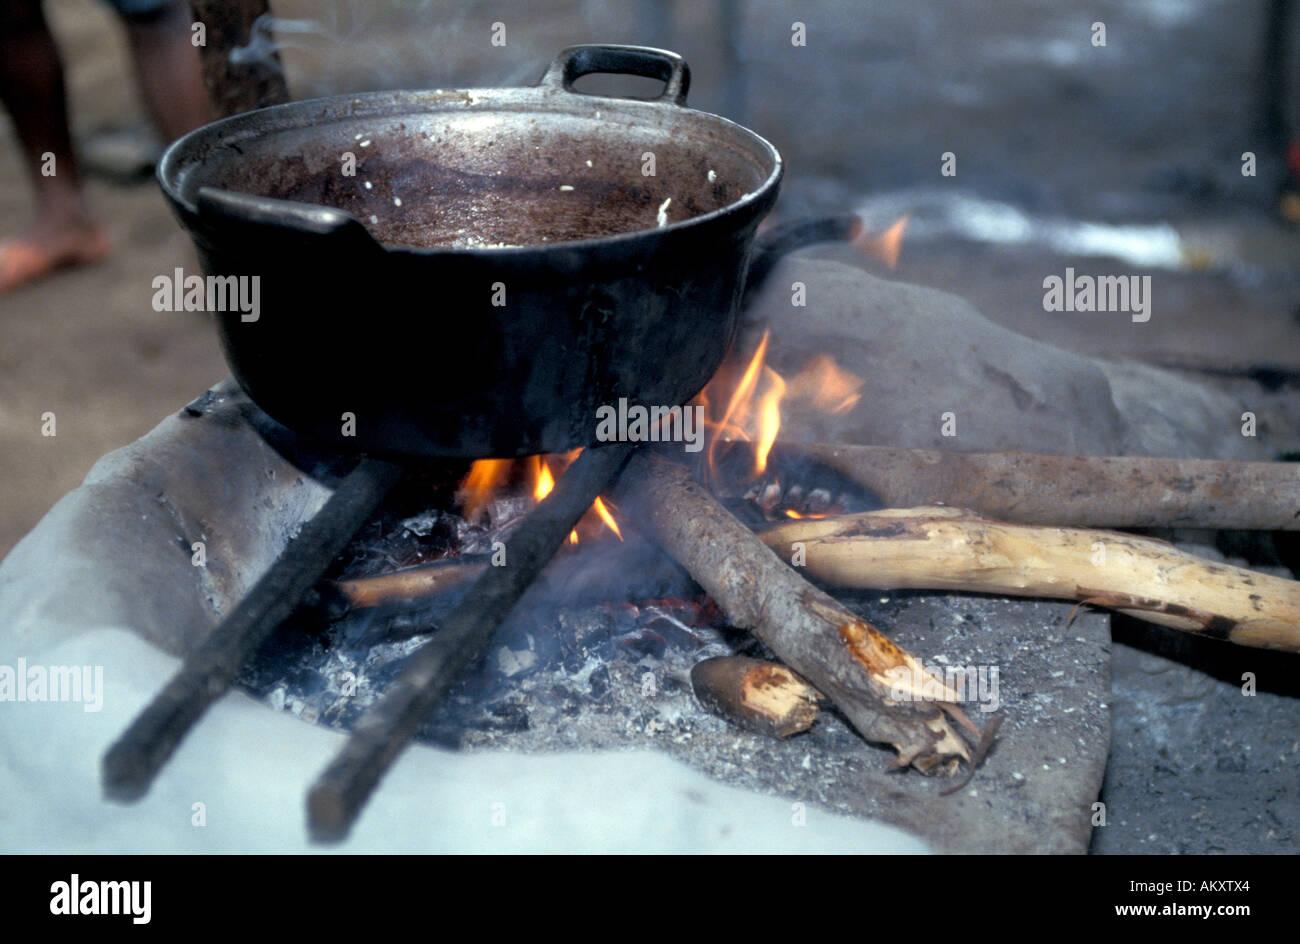 Nicaragua Miskito Coast mosquito indians cooking pot inside hut daily primitive life Stock Photo